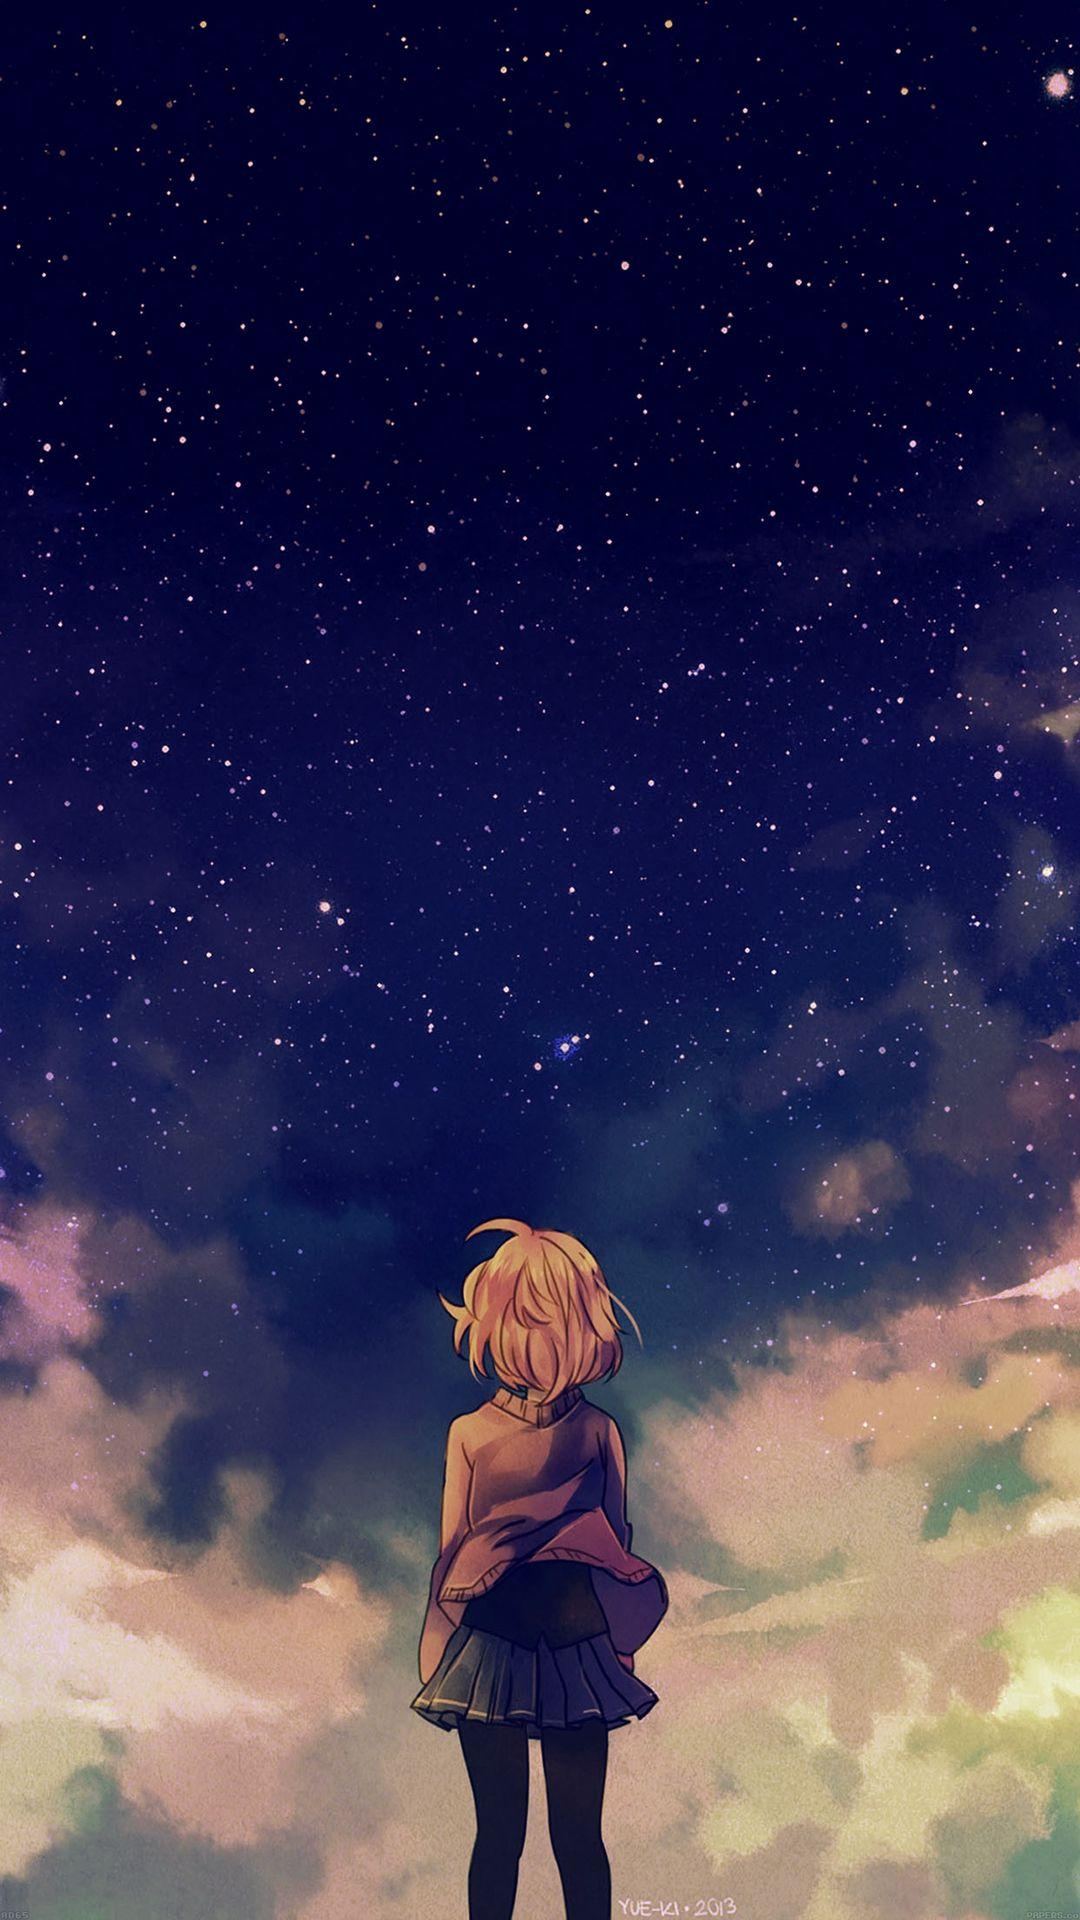 3d Hd Anime Pinterest Wallpapers - Wallpaper Cave